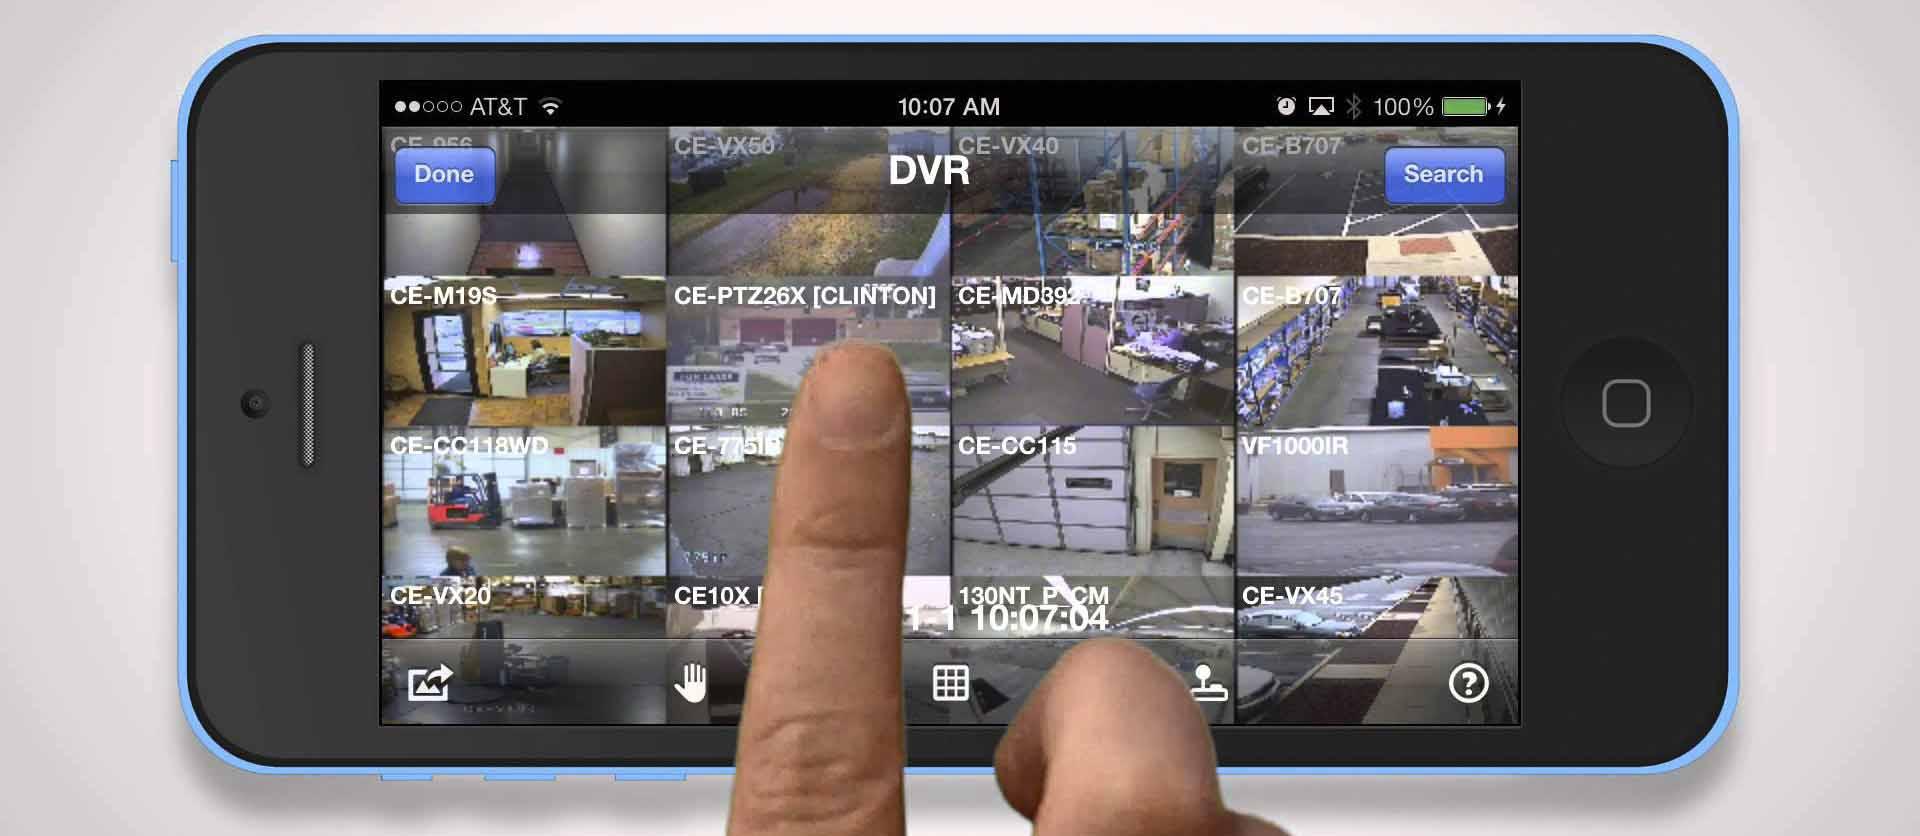 Monitored CCTV Smartphone App